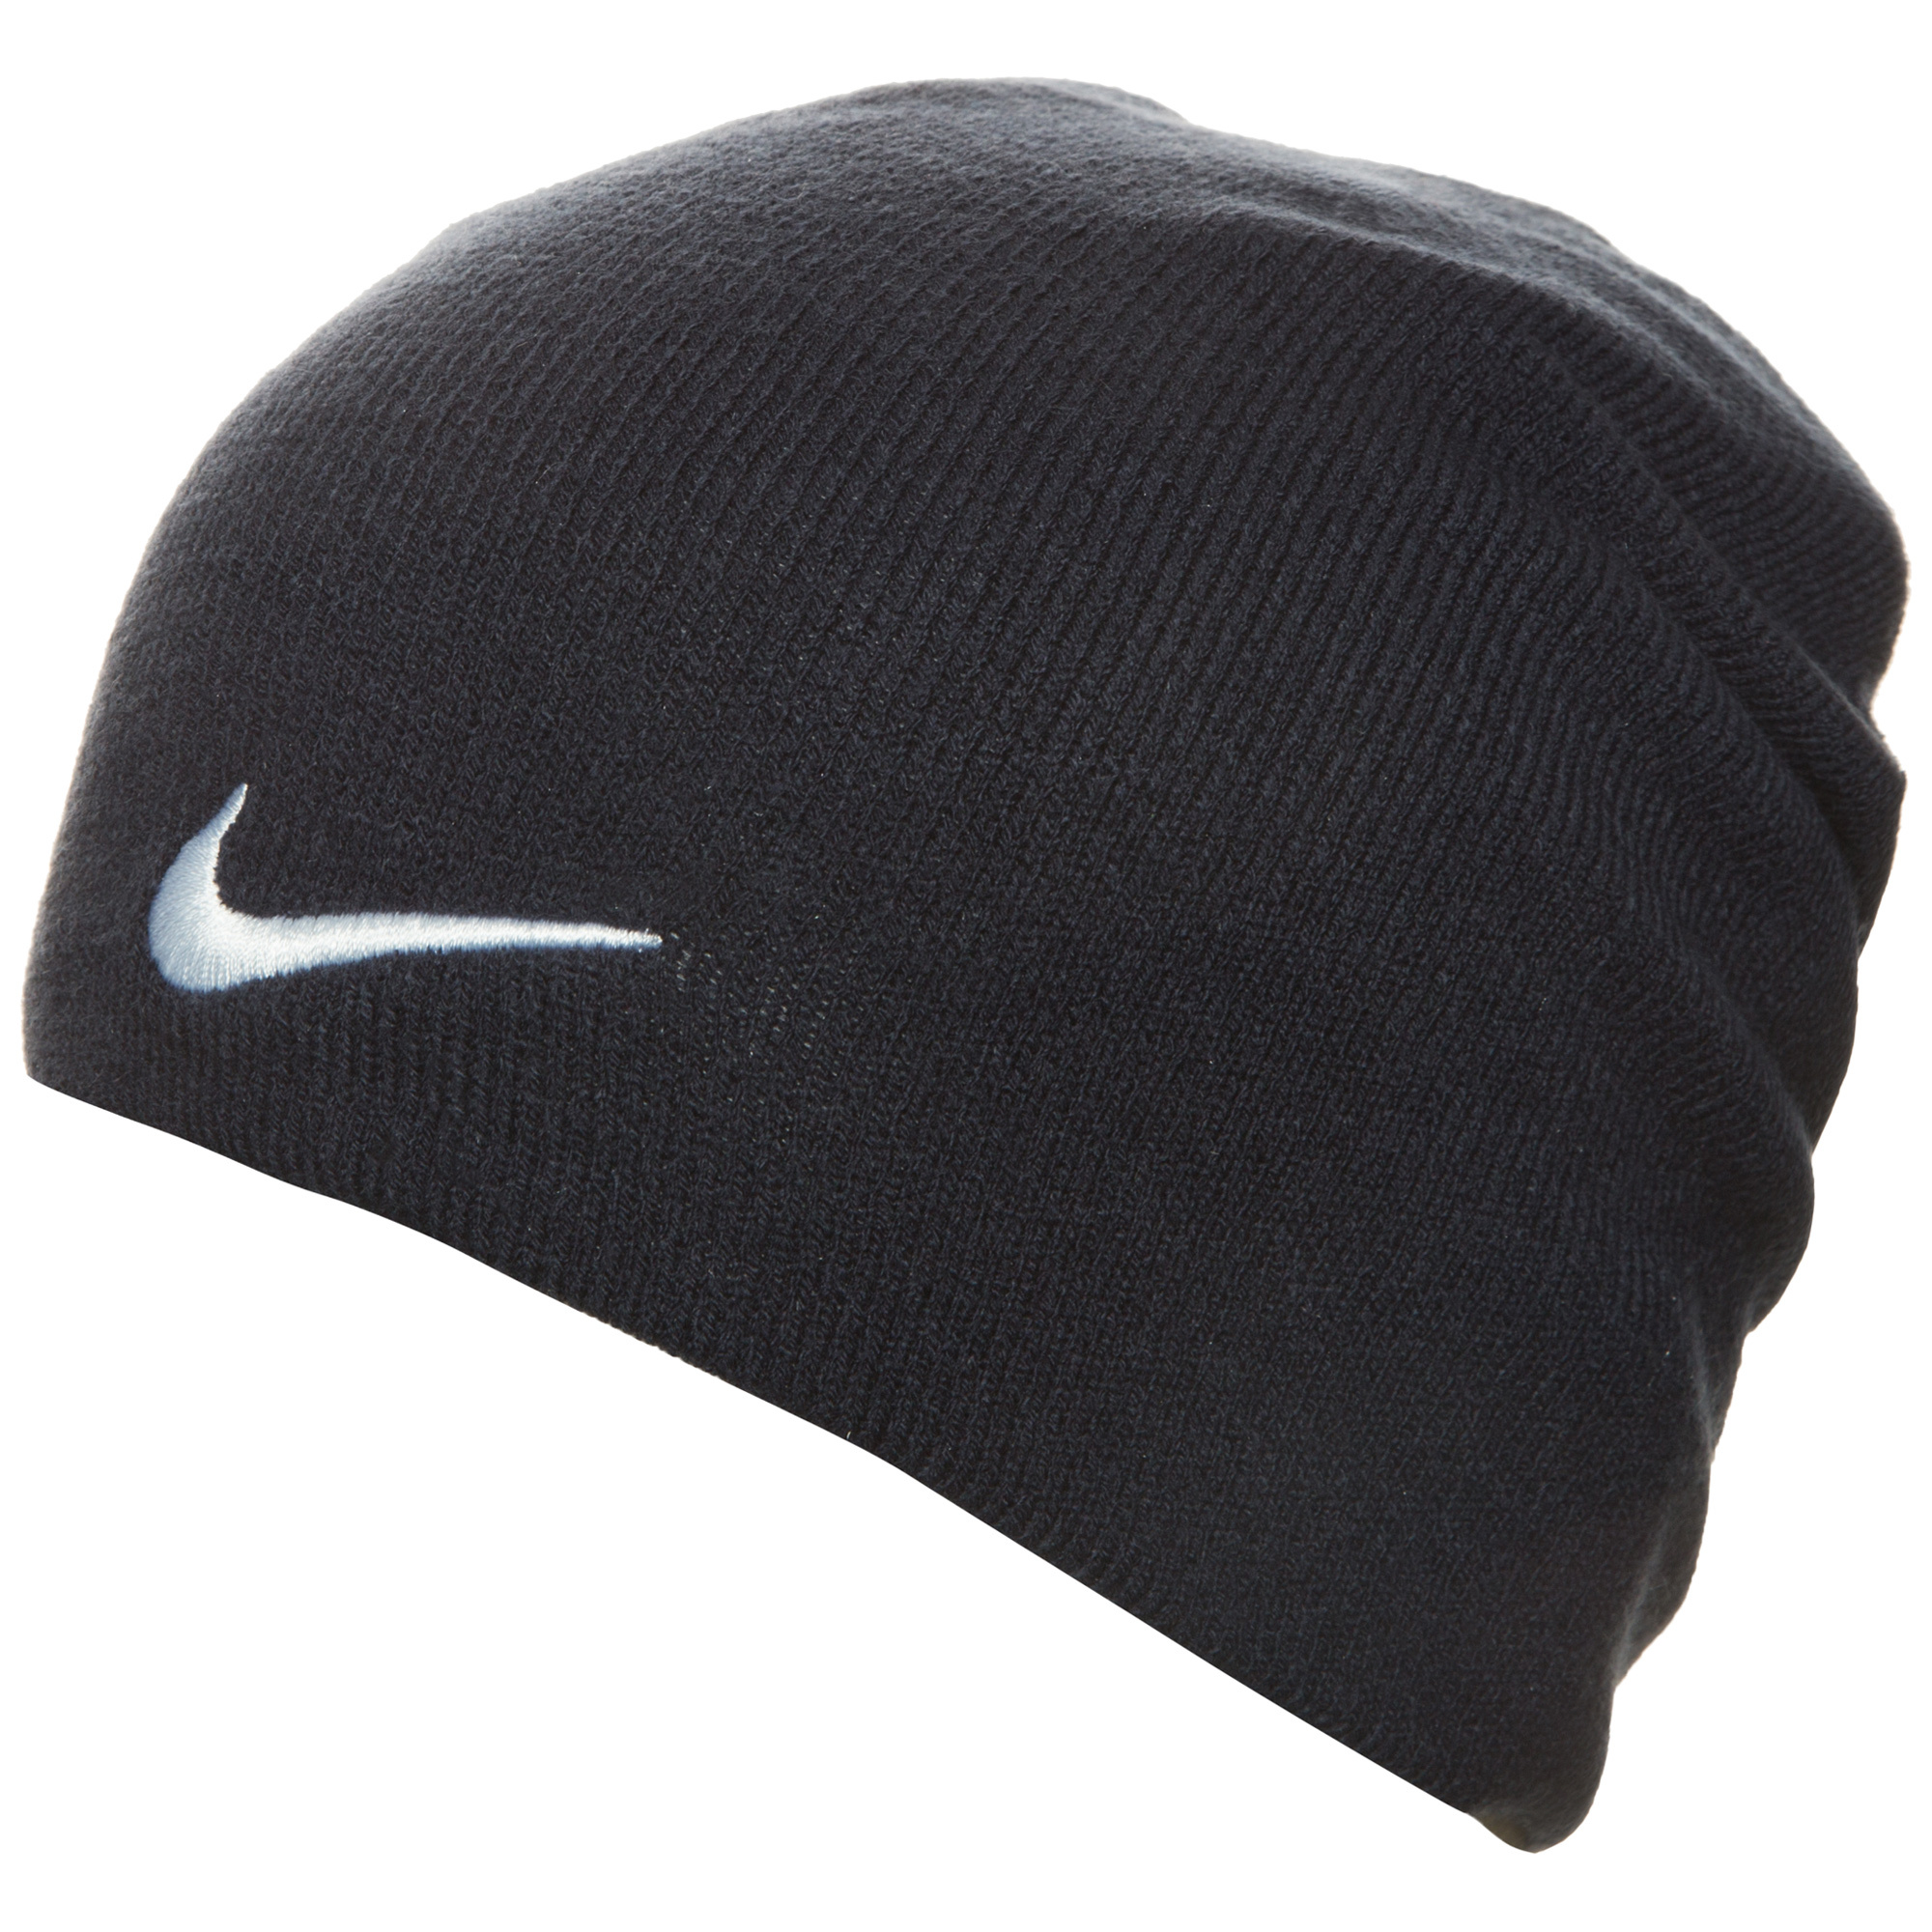 7e8e5f2a3f95ac Nike Beanie Team Performance Obsidian/Football White   646406-451    FOOTY.COM